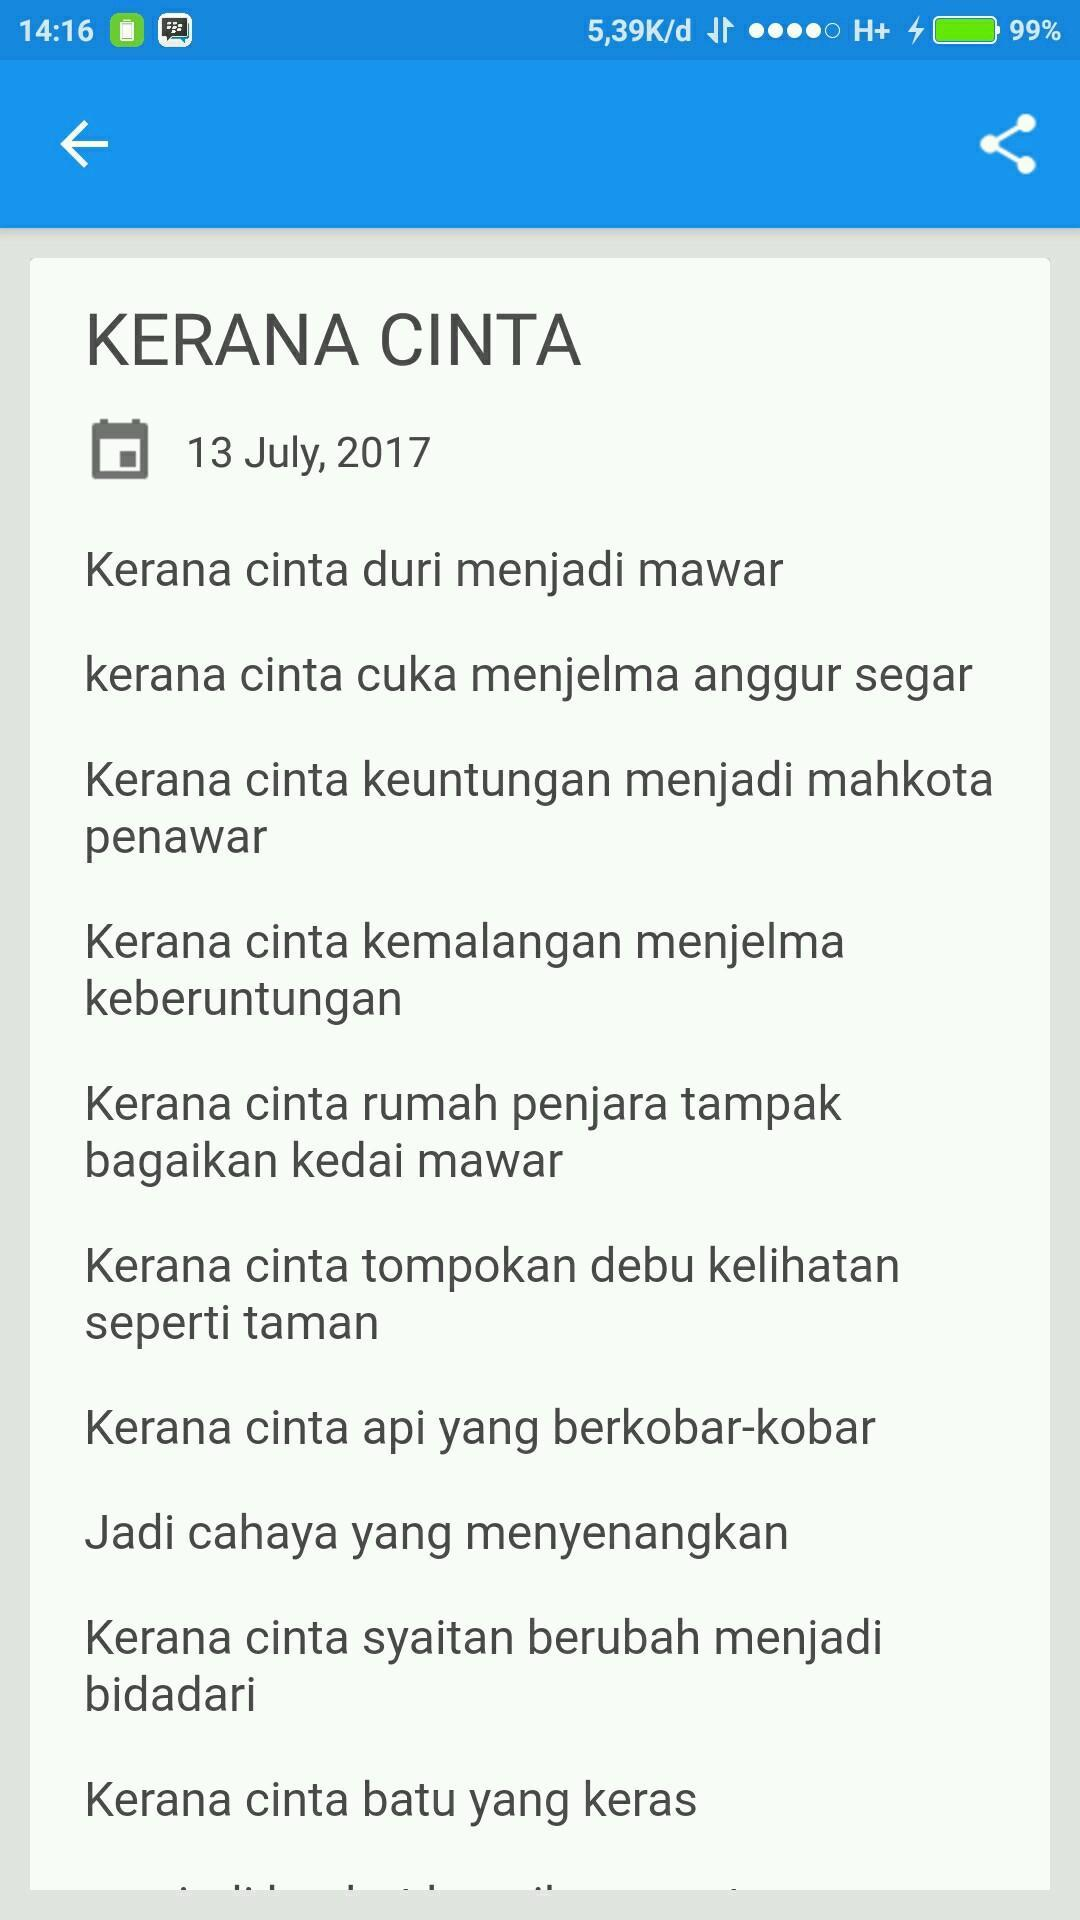 Puisi Jalaludin Rumi Bahasa Cinta For Android Apk Download